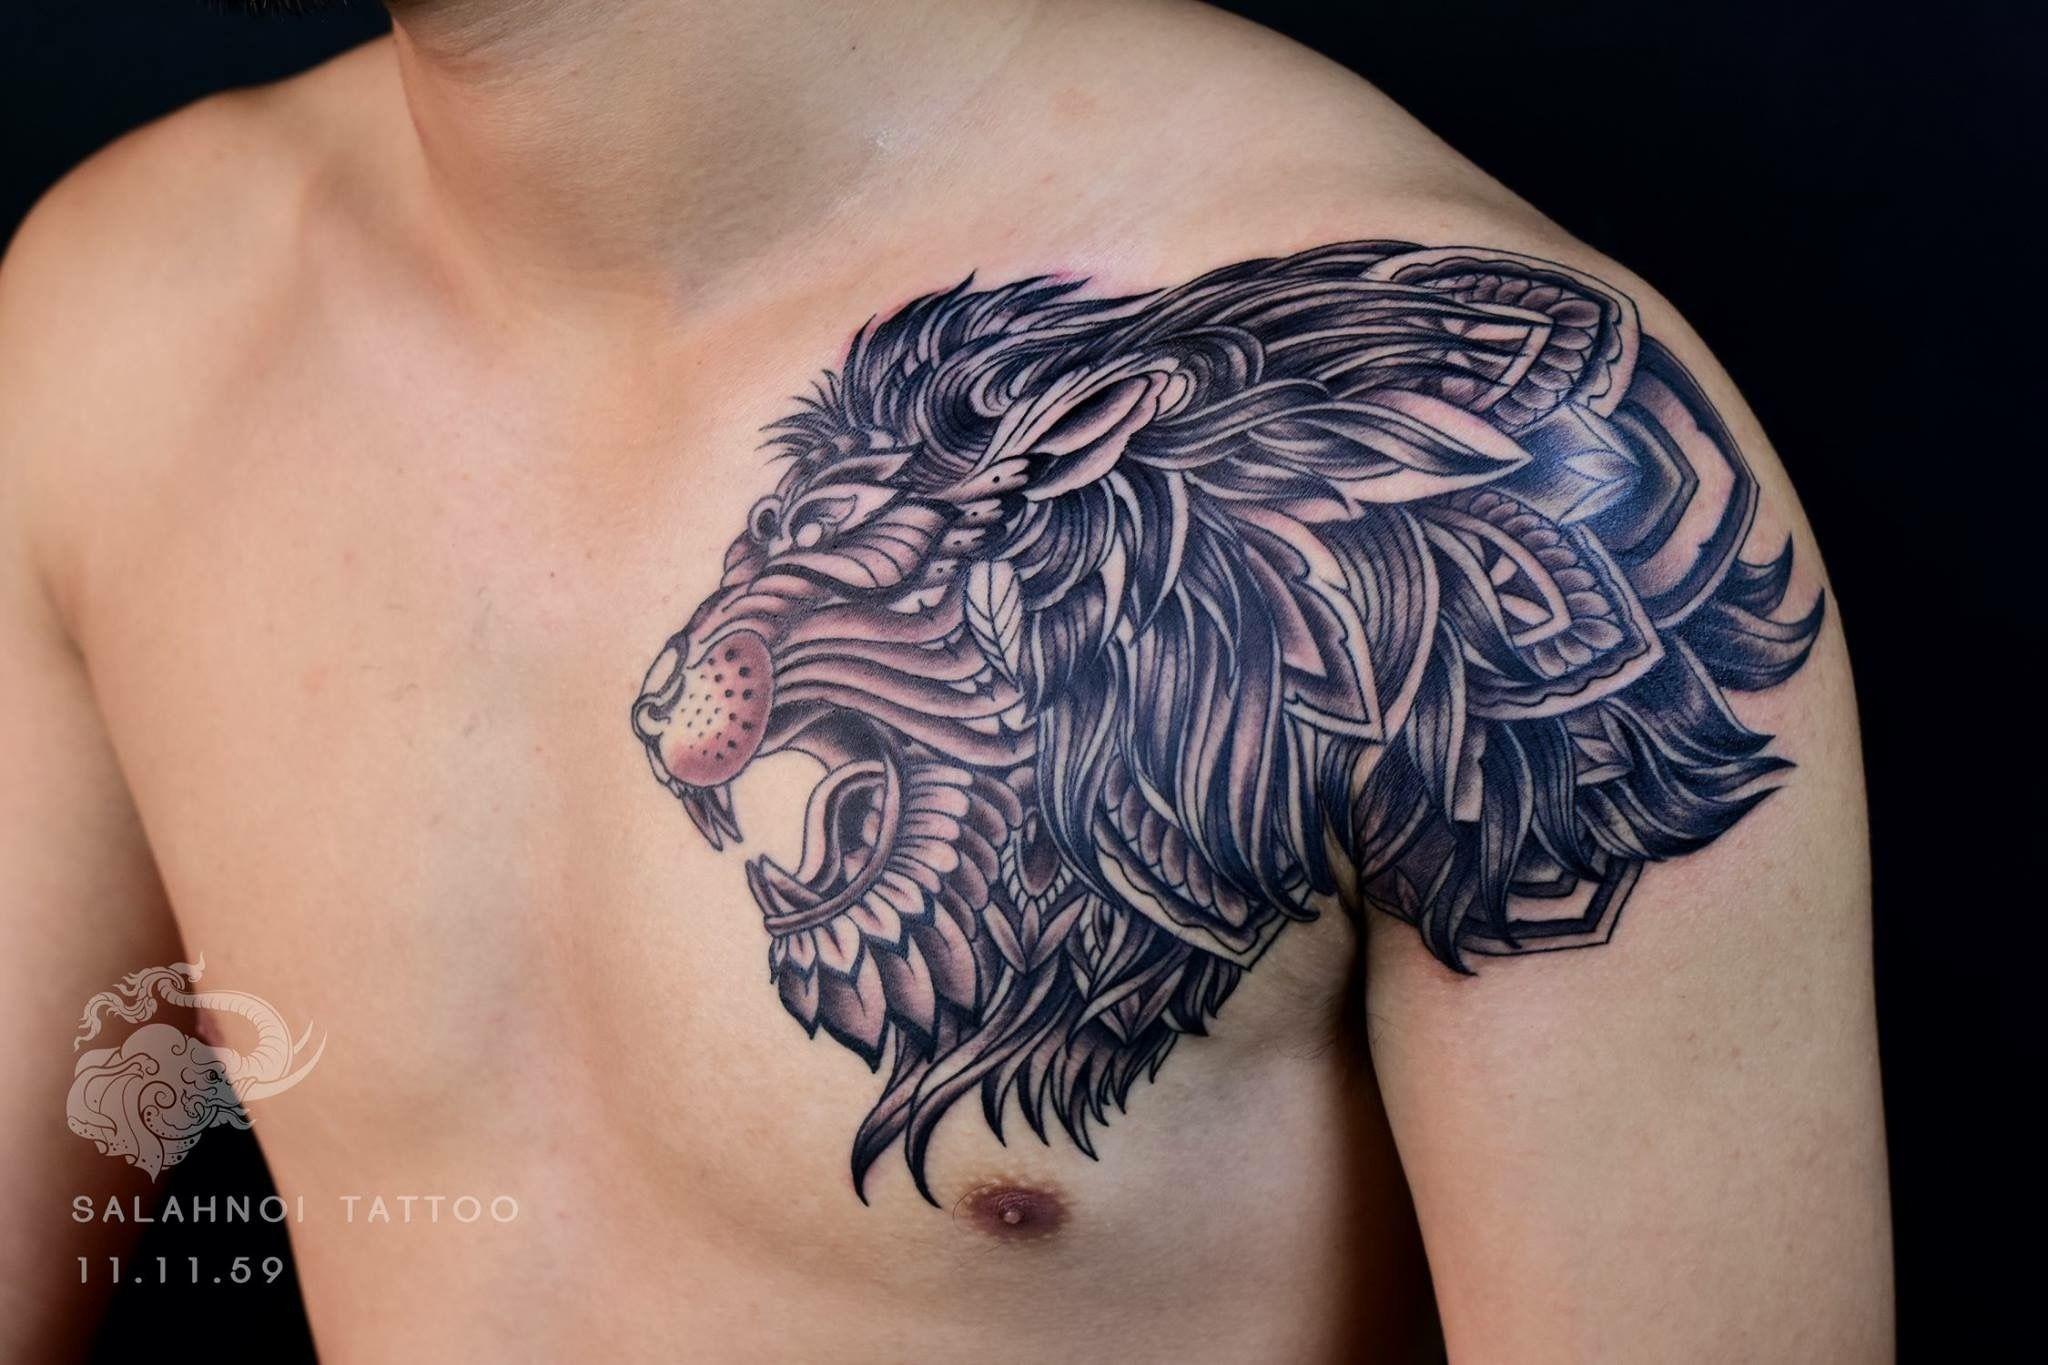 11 11 59 Lion Tattoo Hg Tattoo Machine Inkjectanano Spectahalo2 Silverbackink Skiner Skinnerointment S Tribal Shoulder Tattoos Tattoos Filipino Tattoos